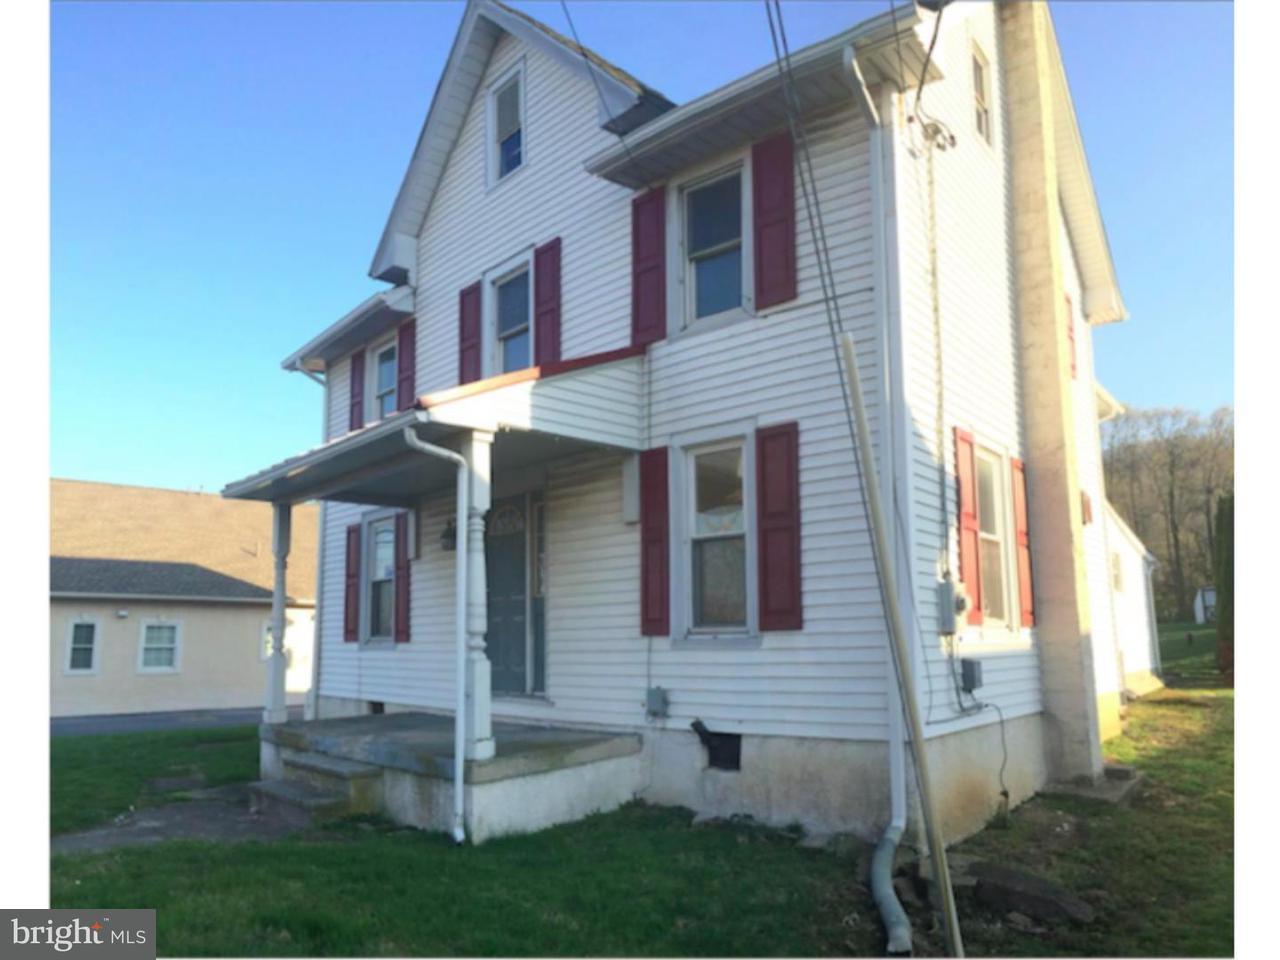 Single Family Home for Rent at 3346 E MAIN Street Birdsboro, Pennsylvania 19508 United States